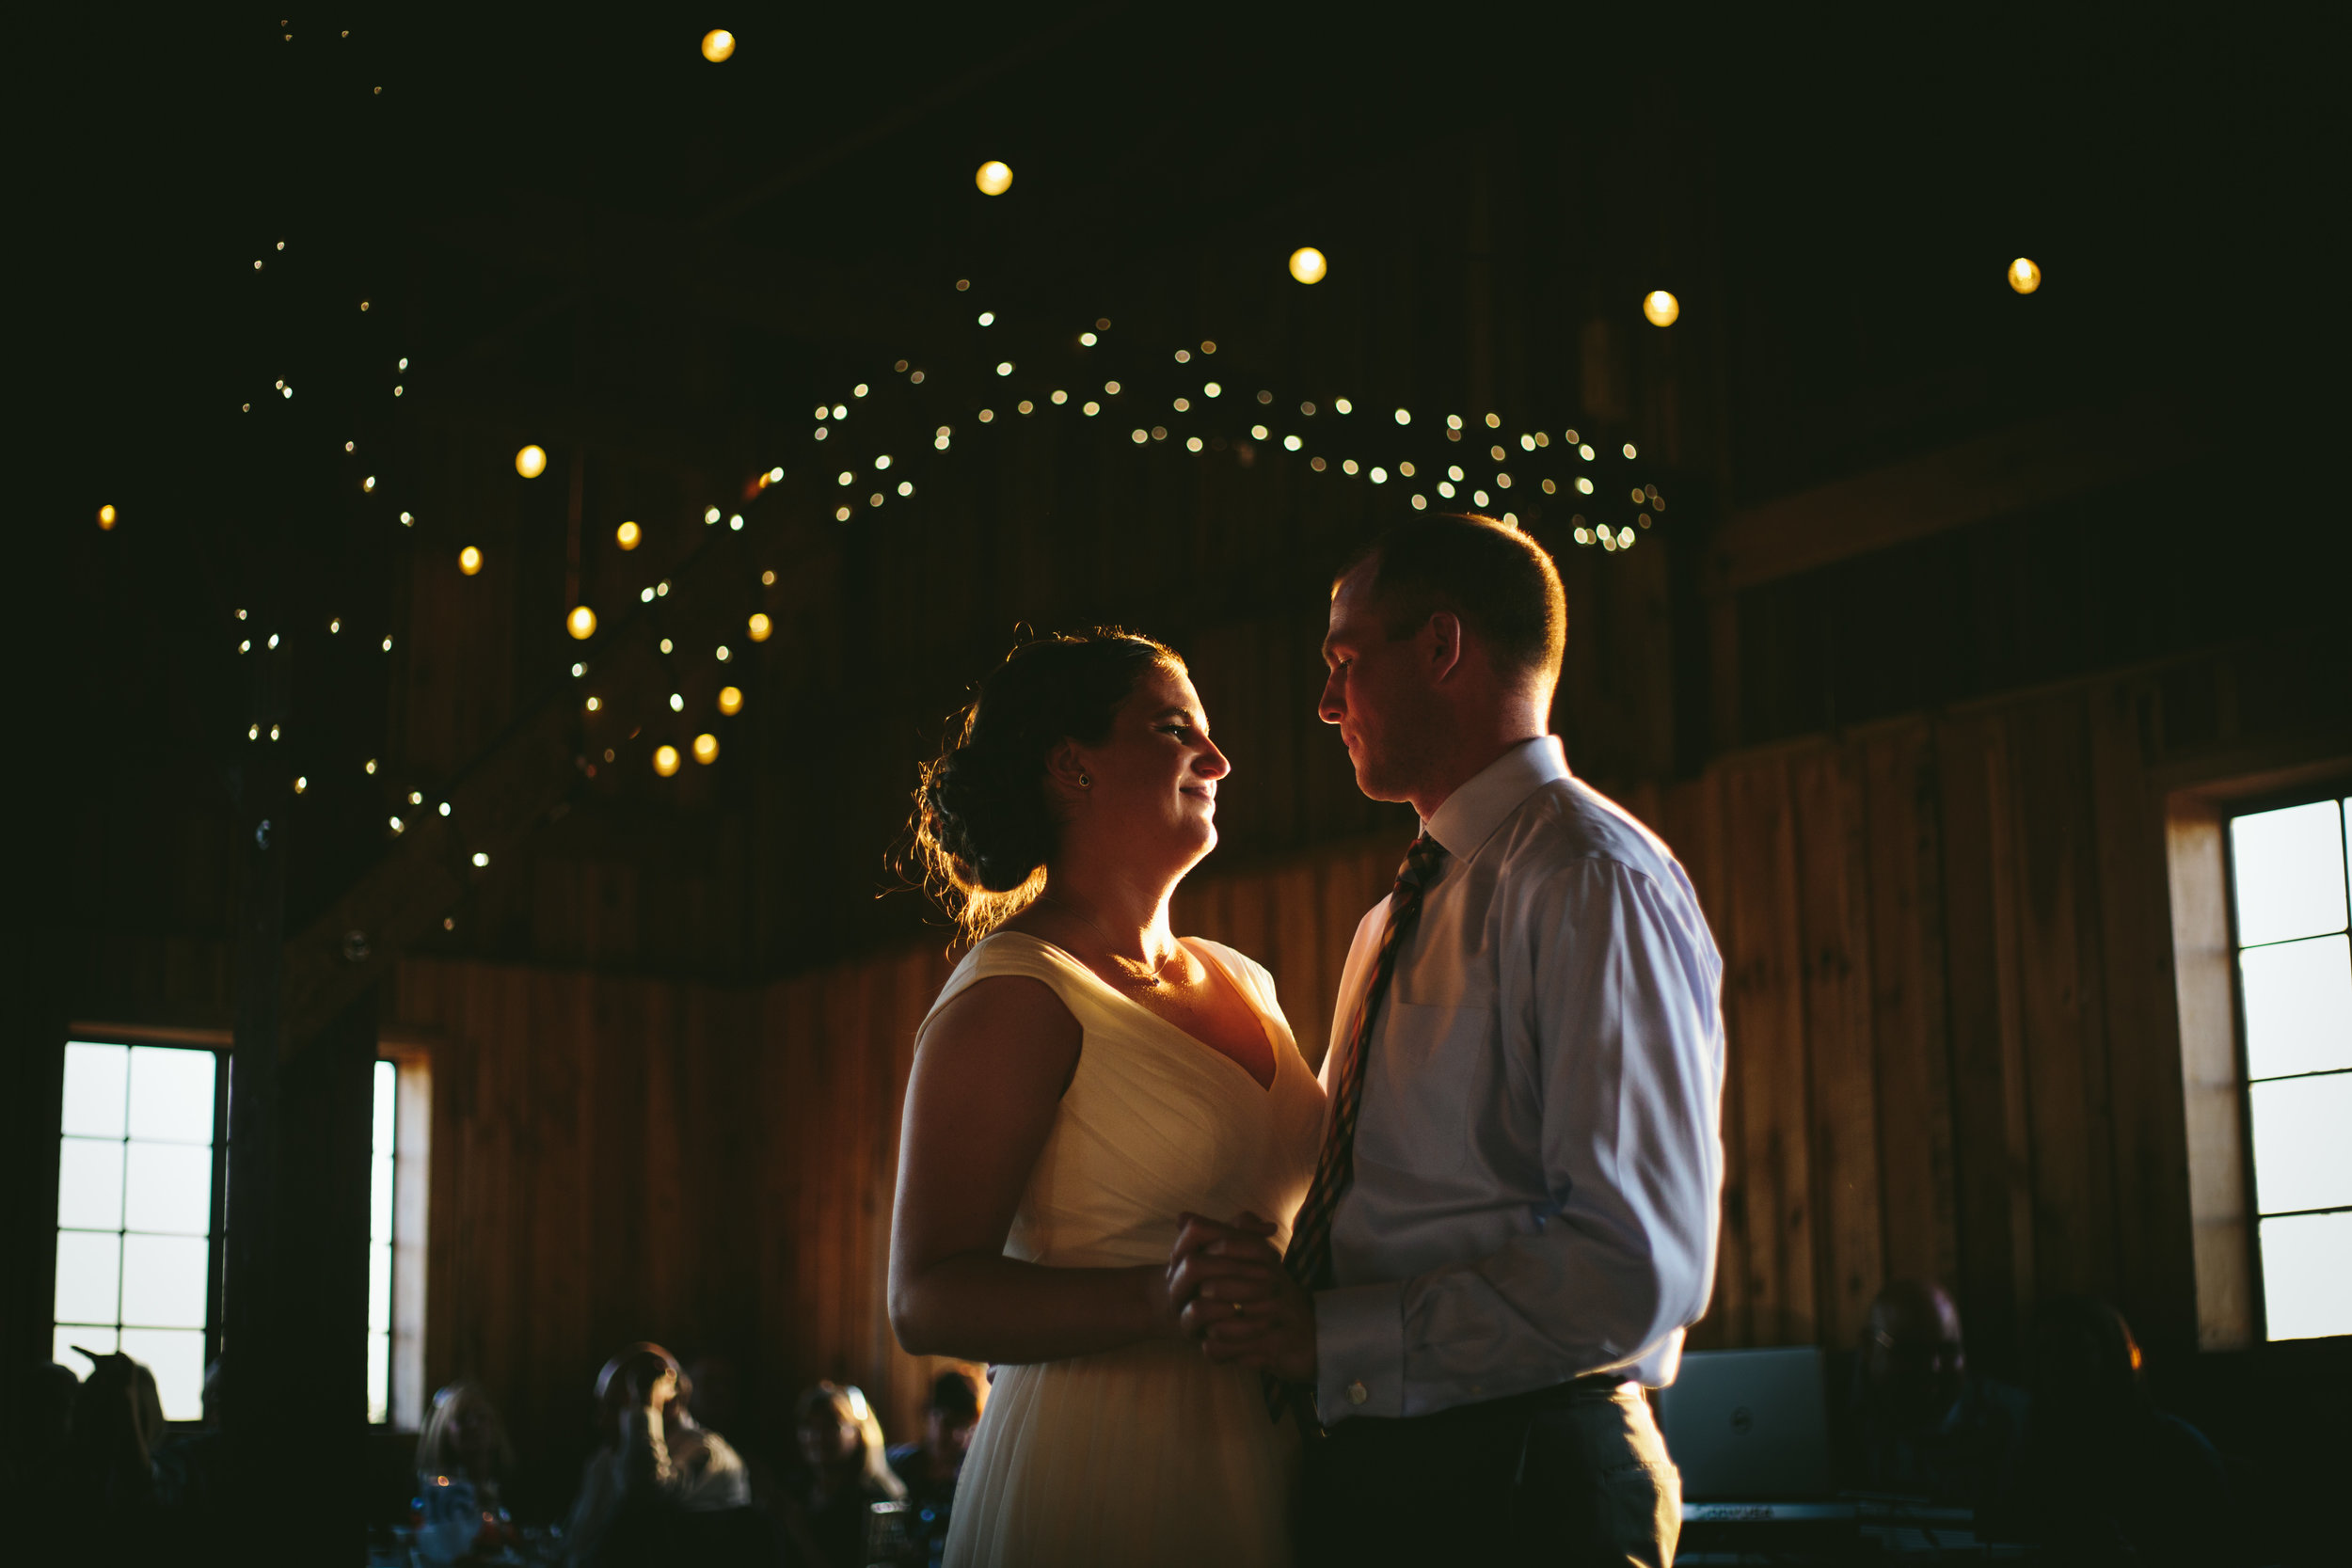 Whitesell-Mattioda Wedding-837.jpg